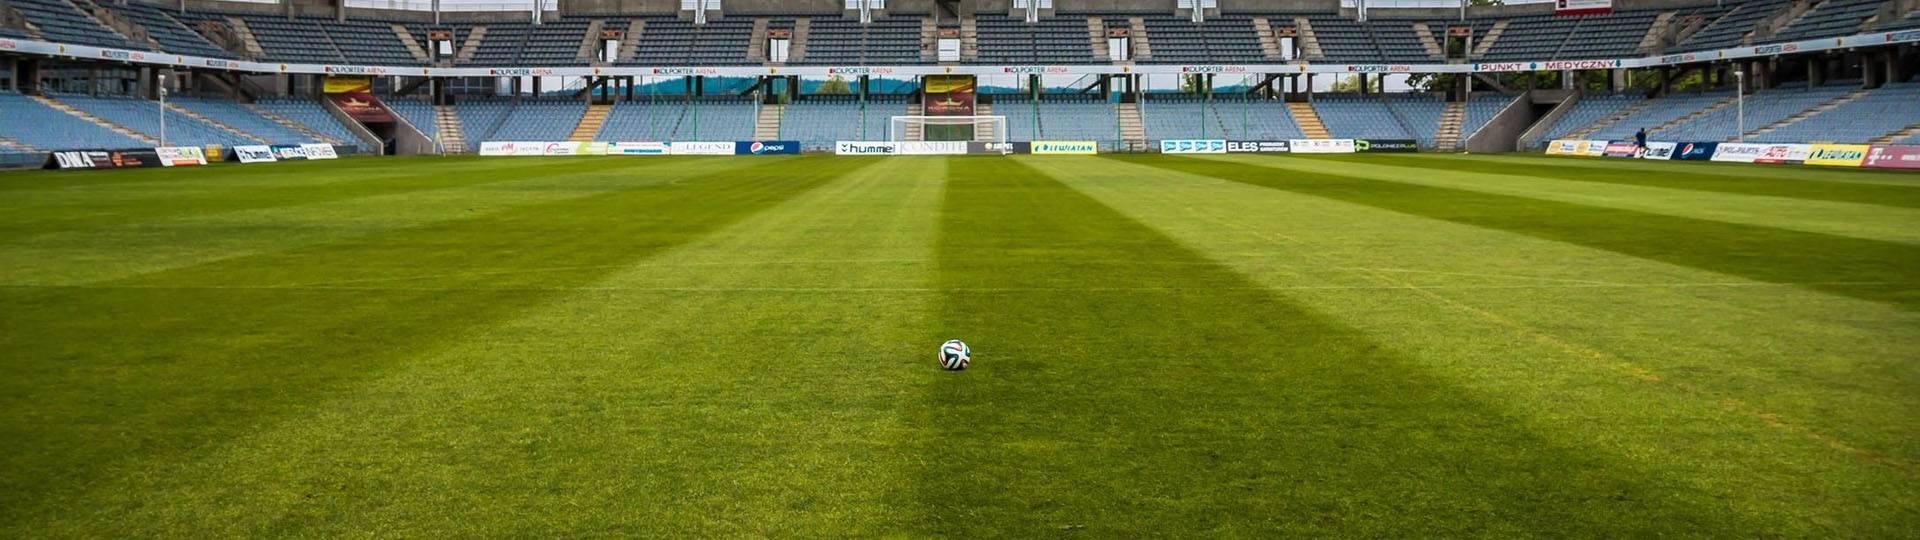 Abogados Derecho Deportivo Madrid